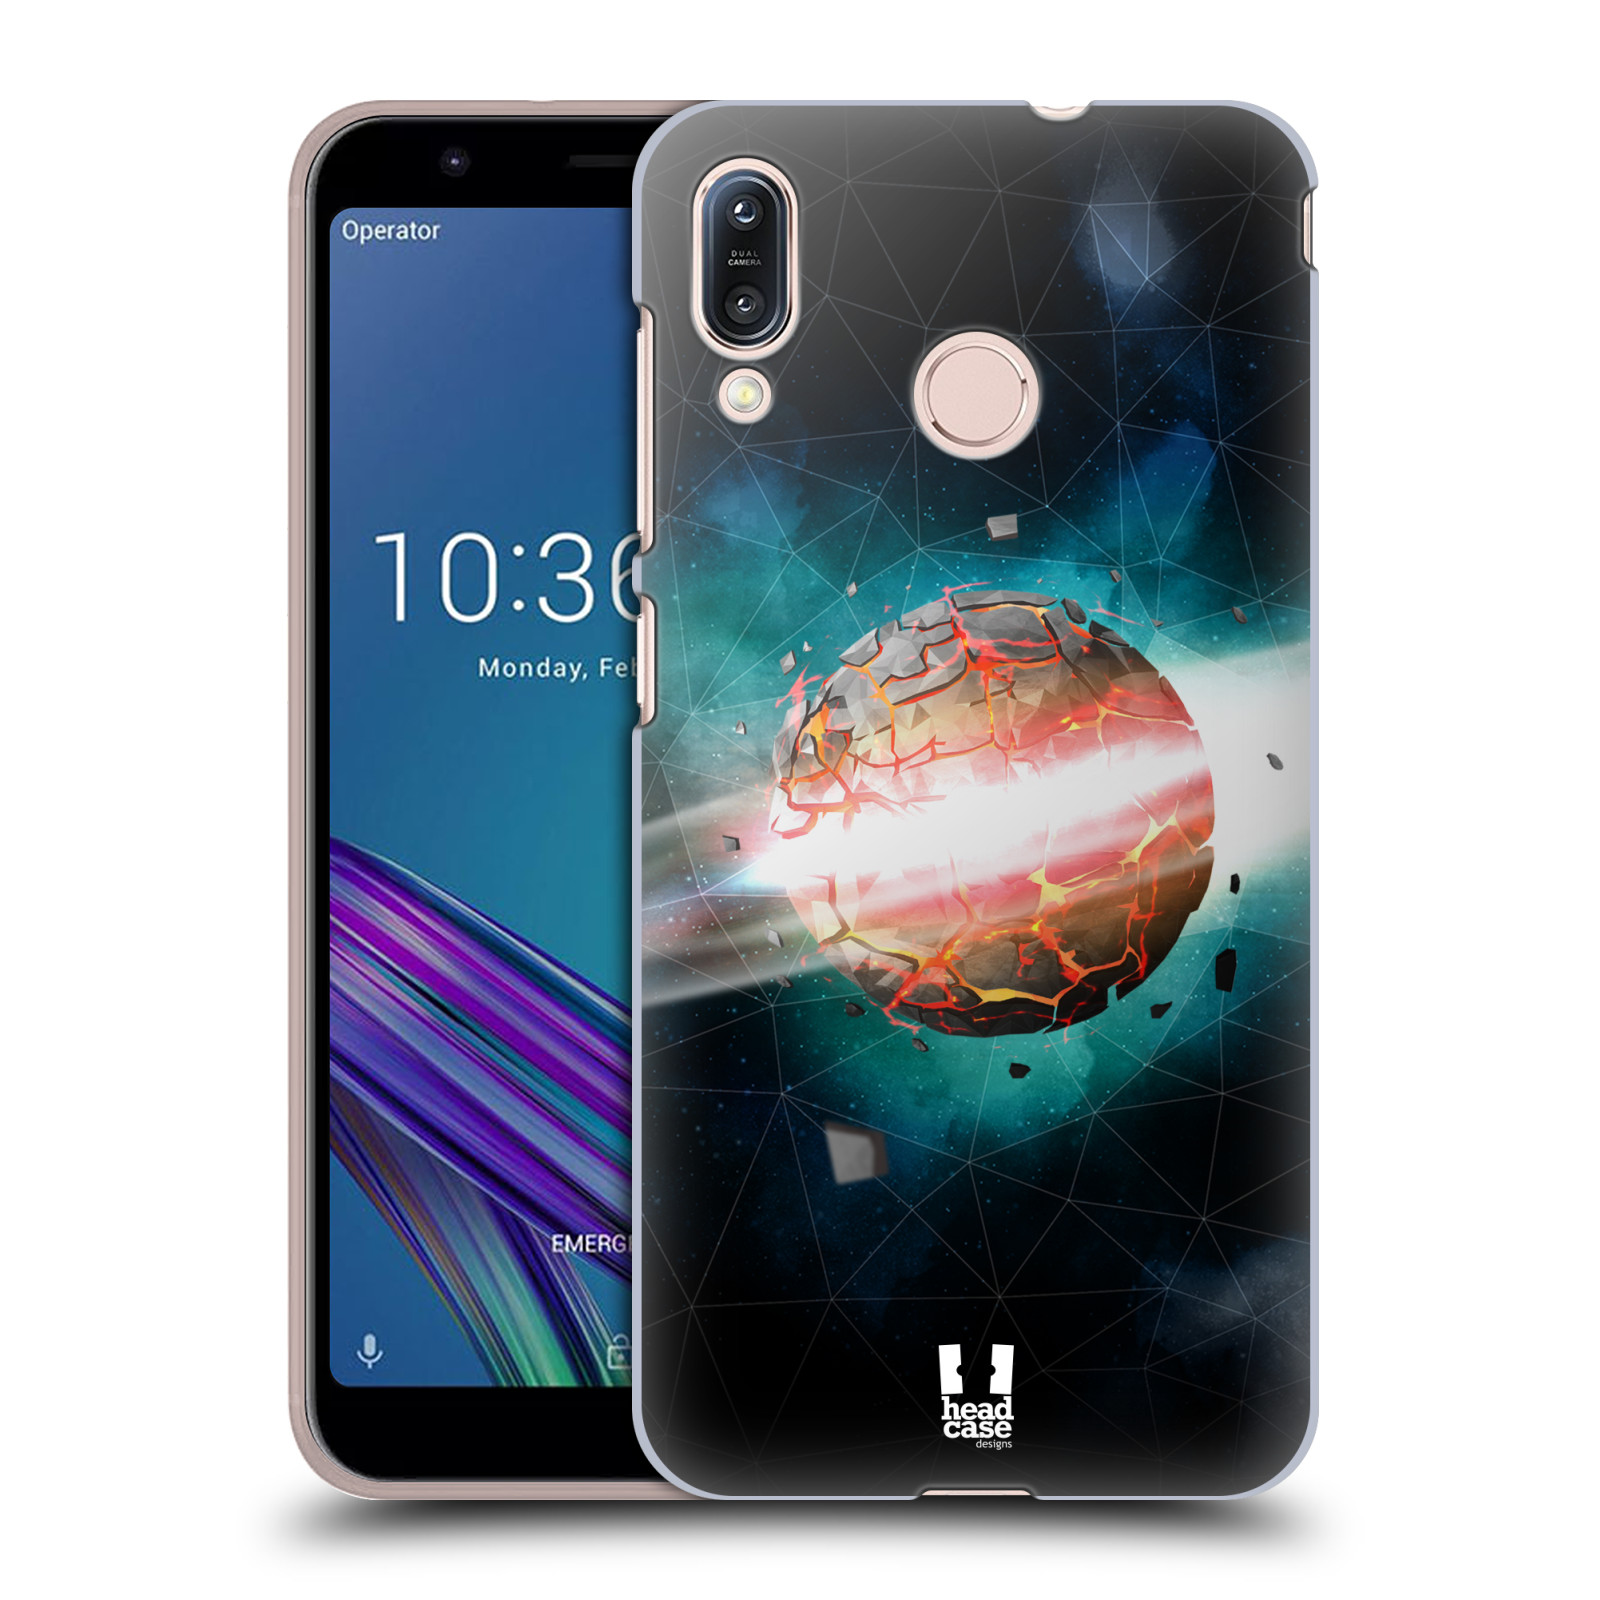 Plastové pouzdro na mobil Asus Zenfone Max M1 ZB555KL - Head Case - UNIVERSE EXPLOSION